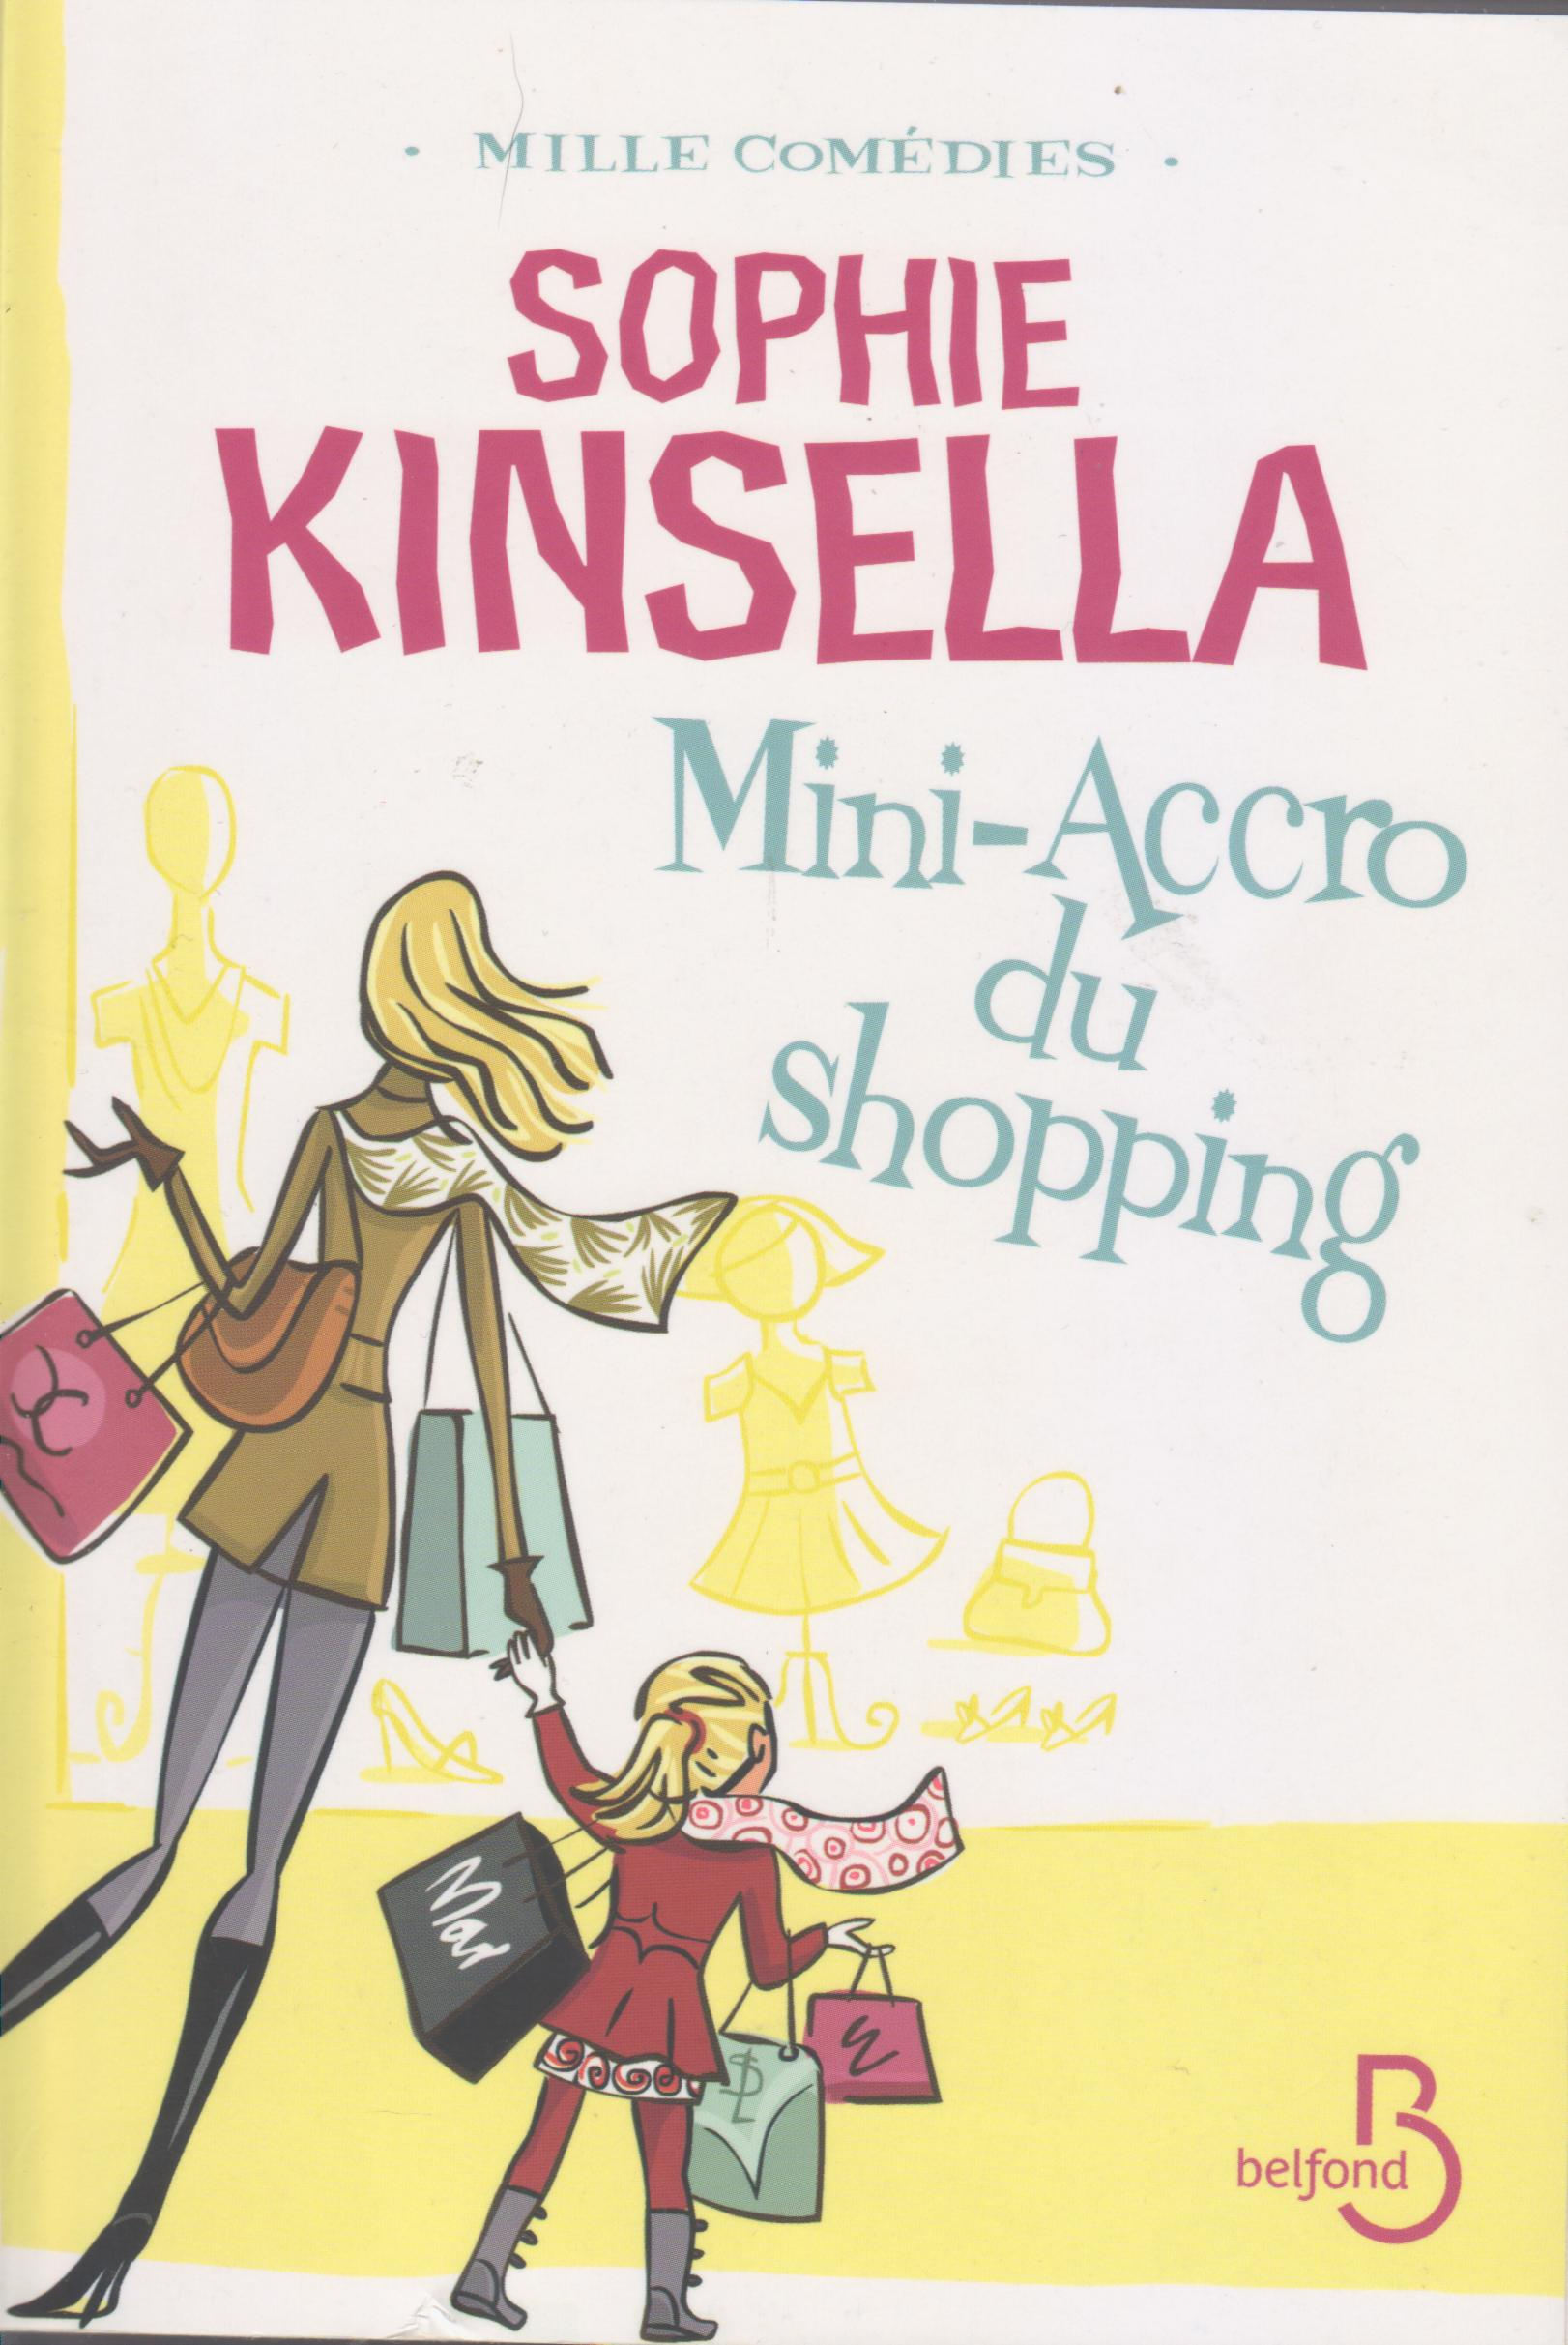 Mini-Accro du shopping - S.Kinsella - Les lectures de Liyah